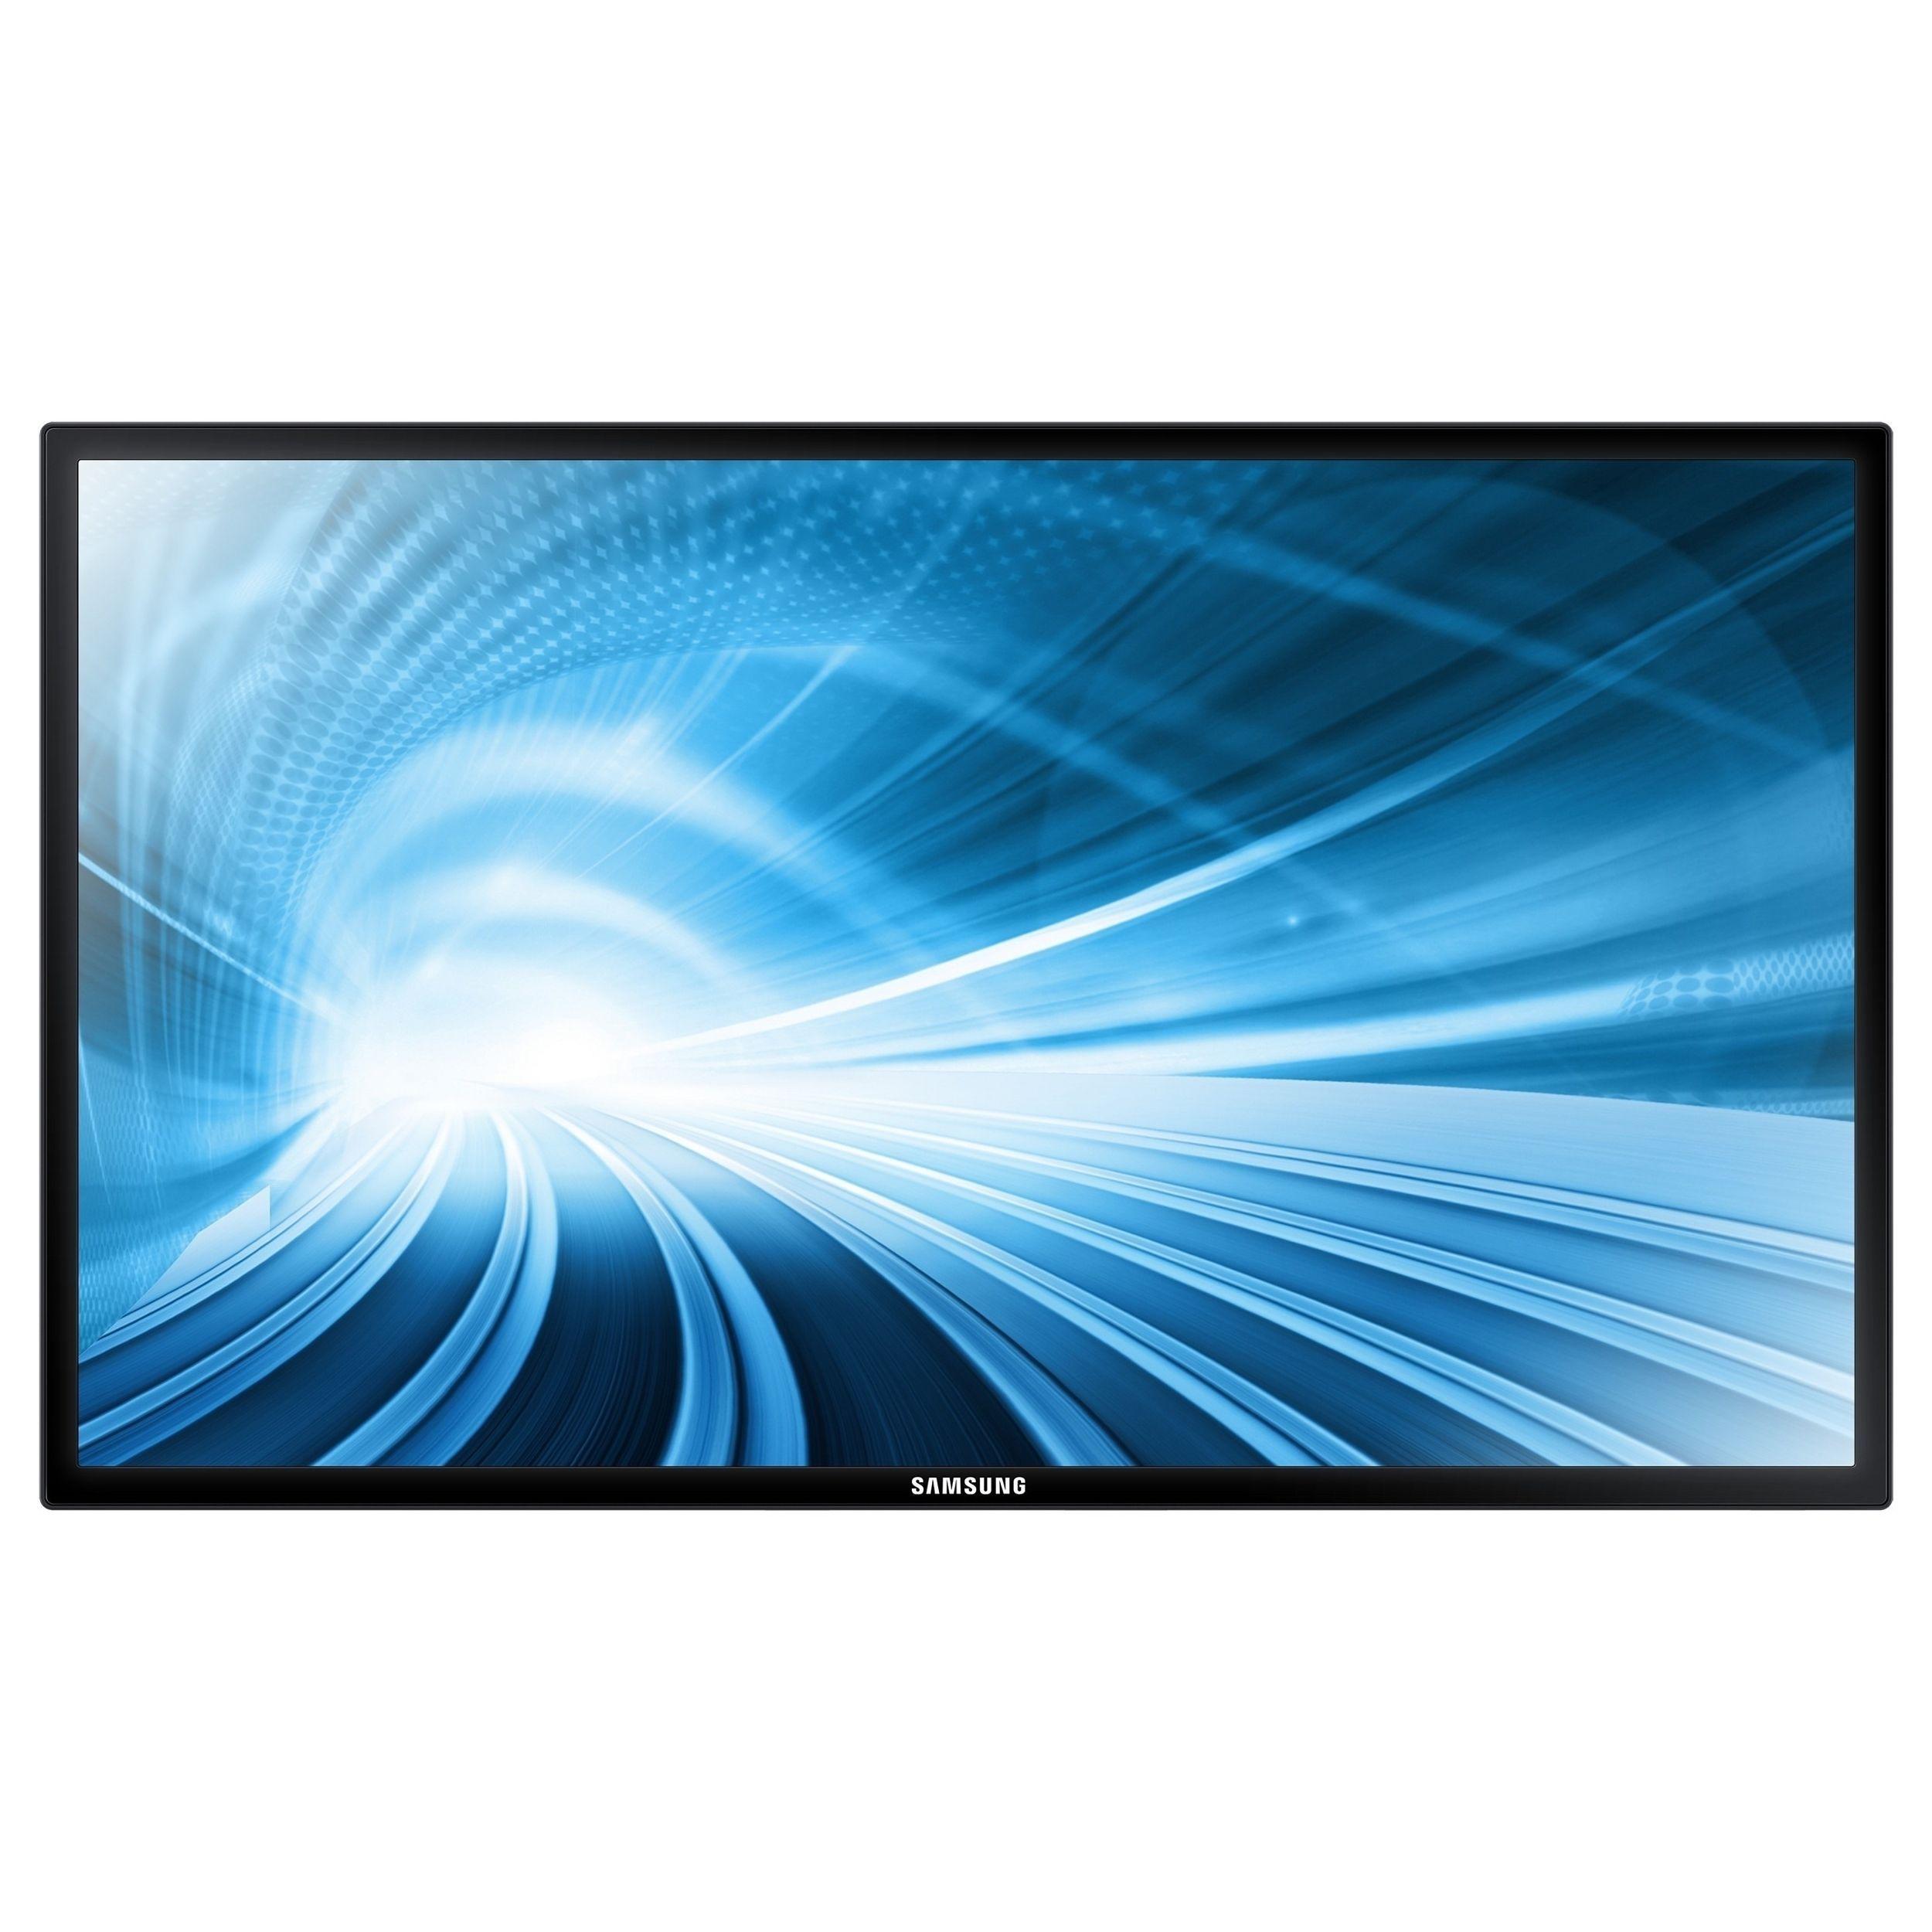 "Samsung ED32D ED D Series 32"" Direct Lit LED Display"